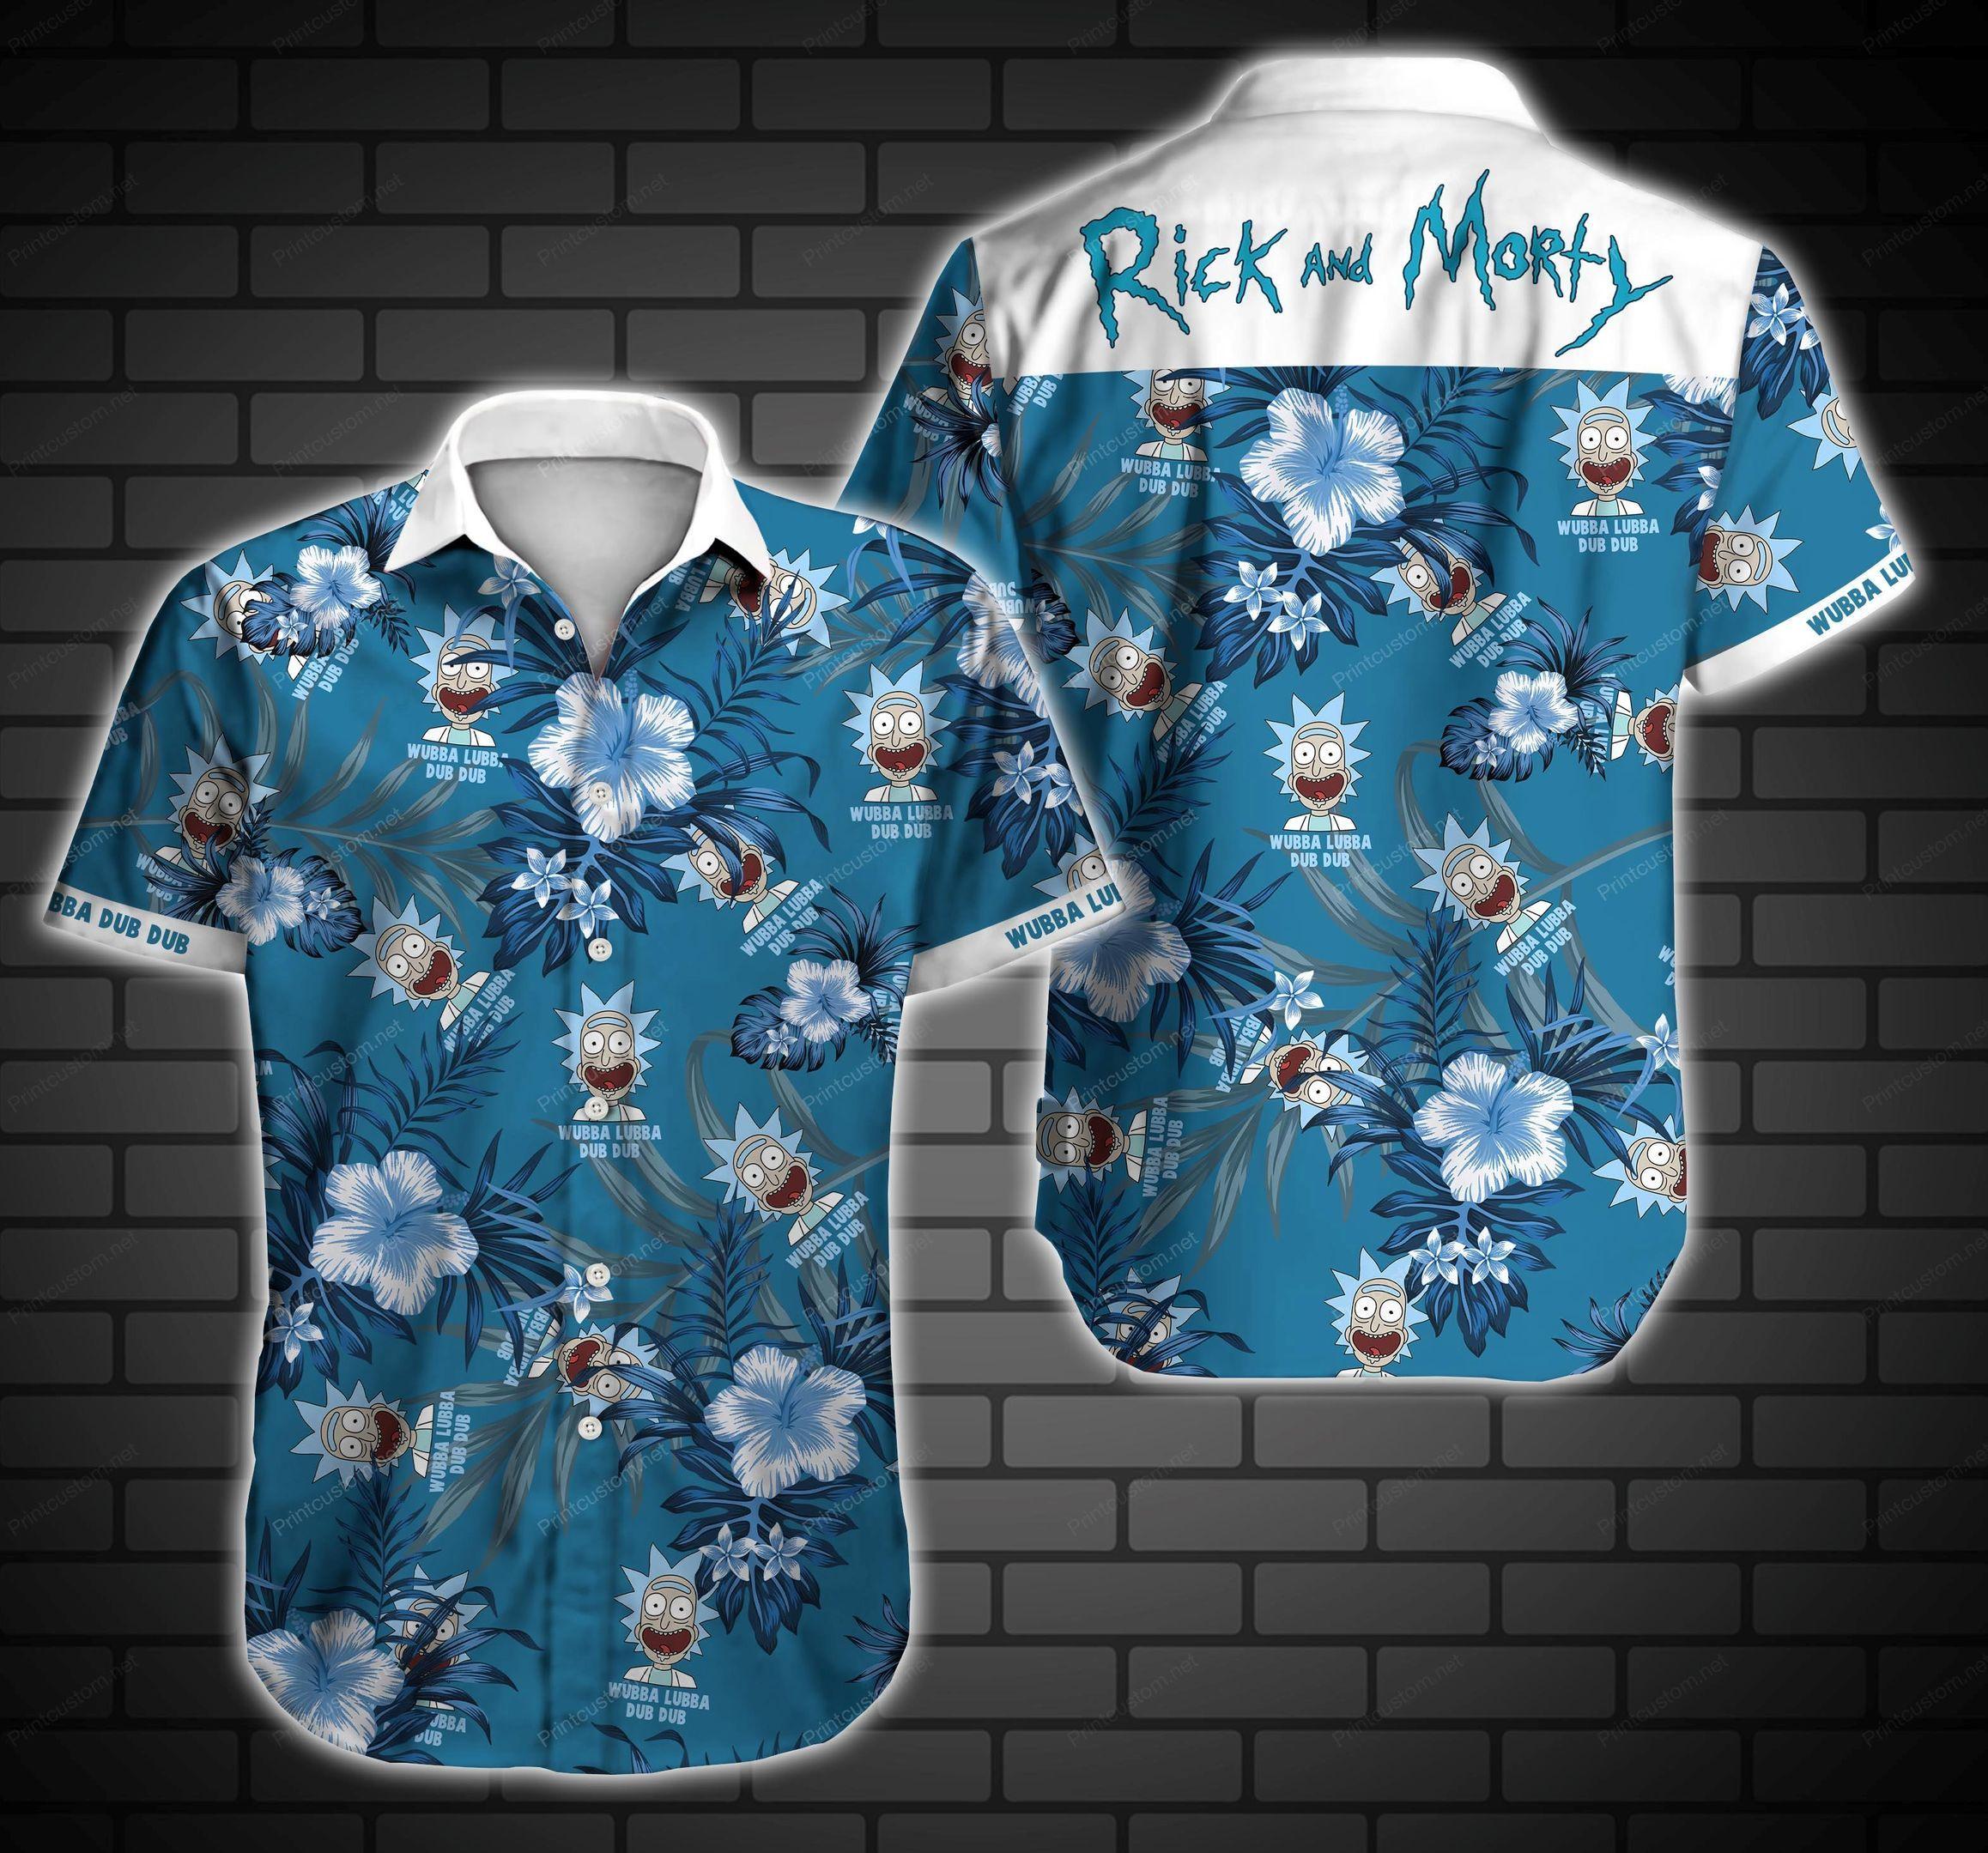 Rick and Morty Wubba Lubba Dub Dub Hawaii Shirt